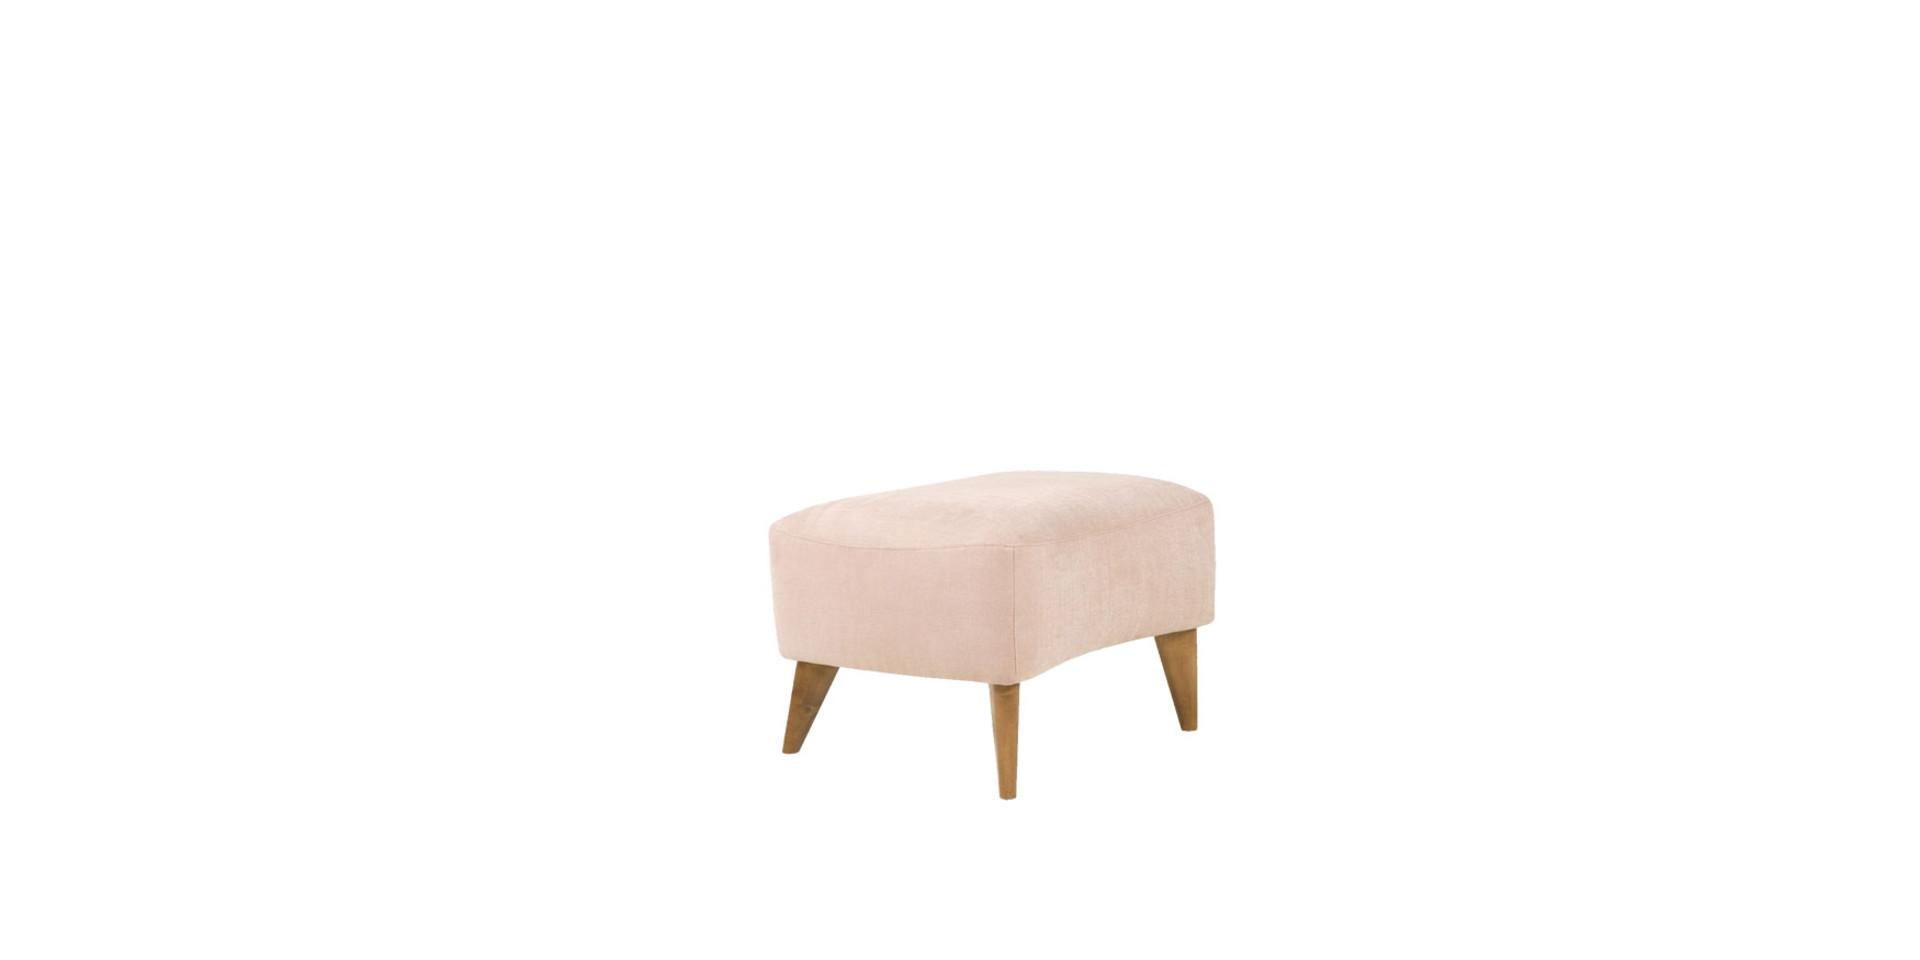 ELSA_footstool_caleido2994_light_brown_3_0